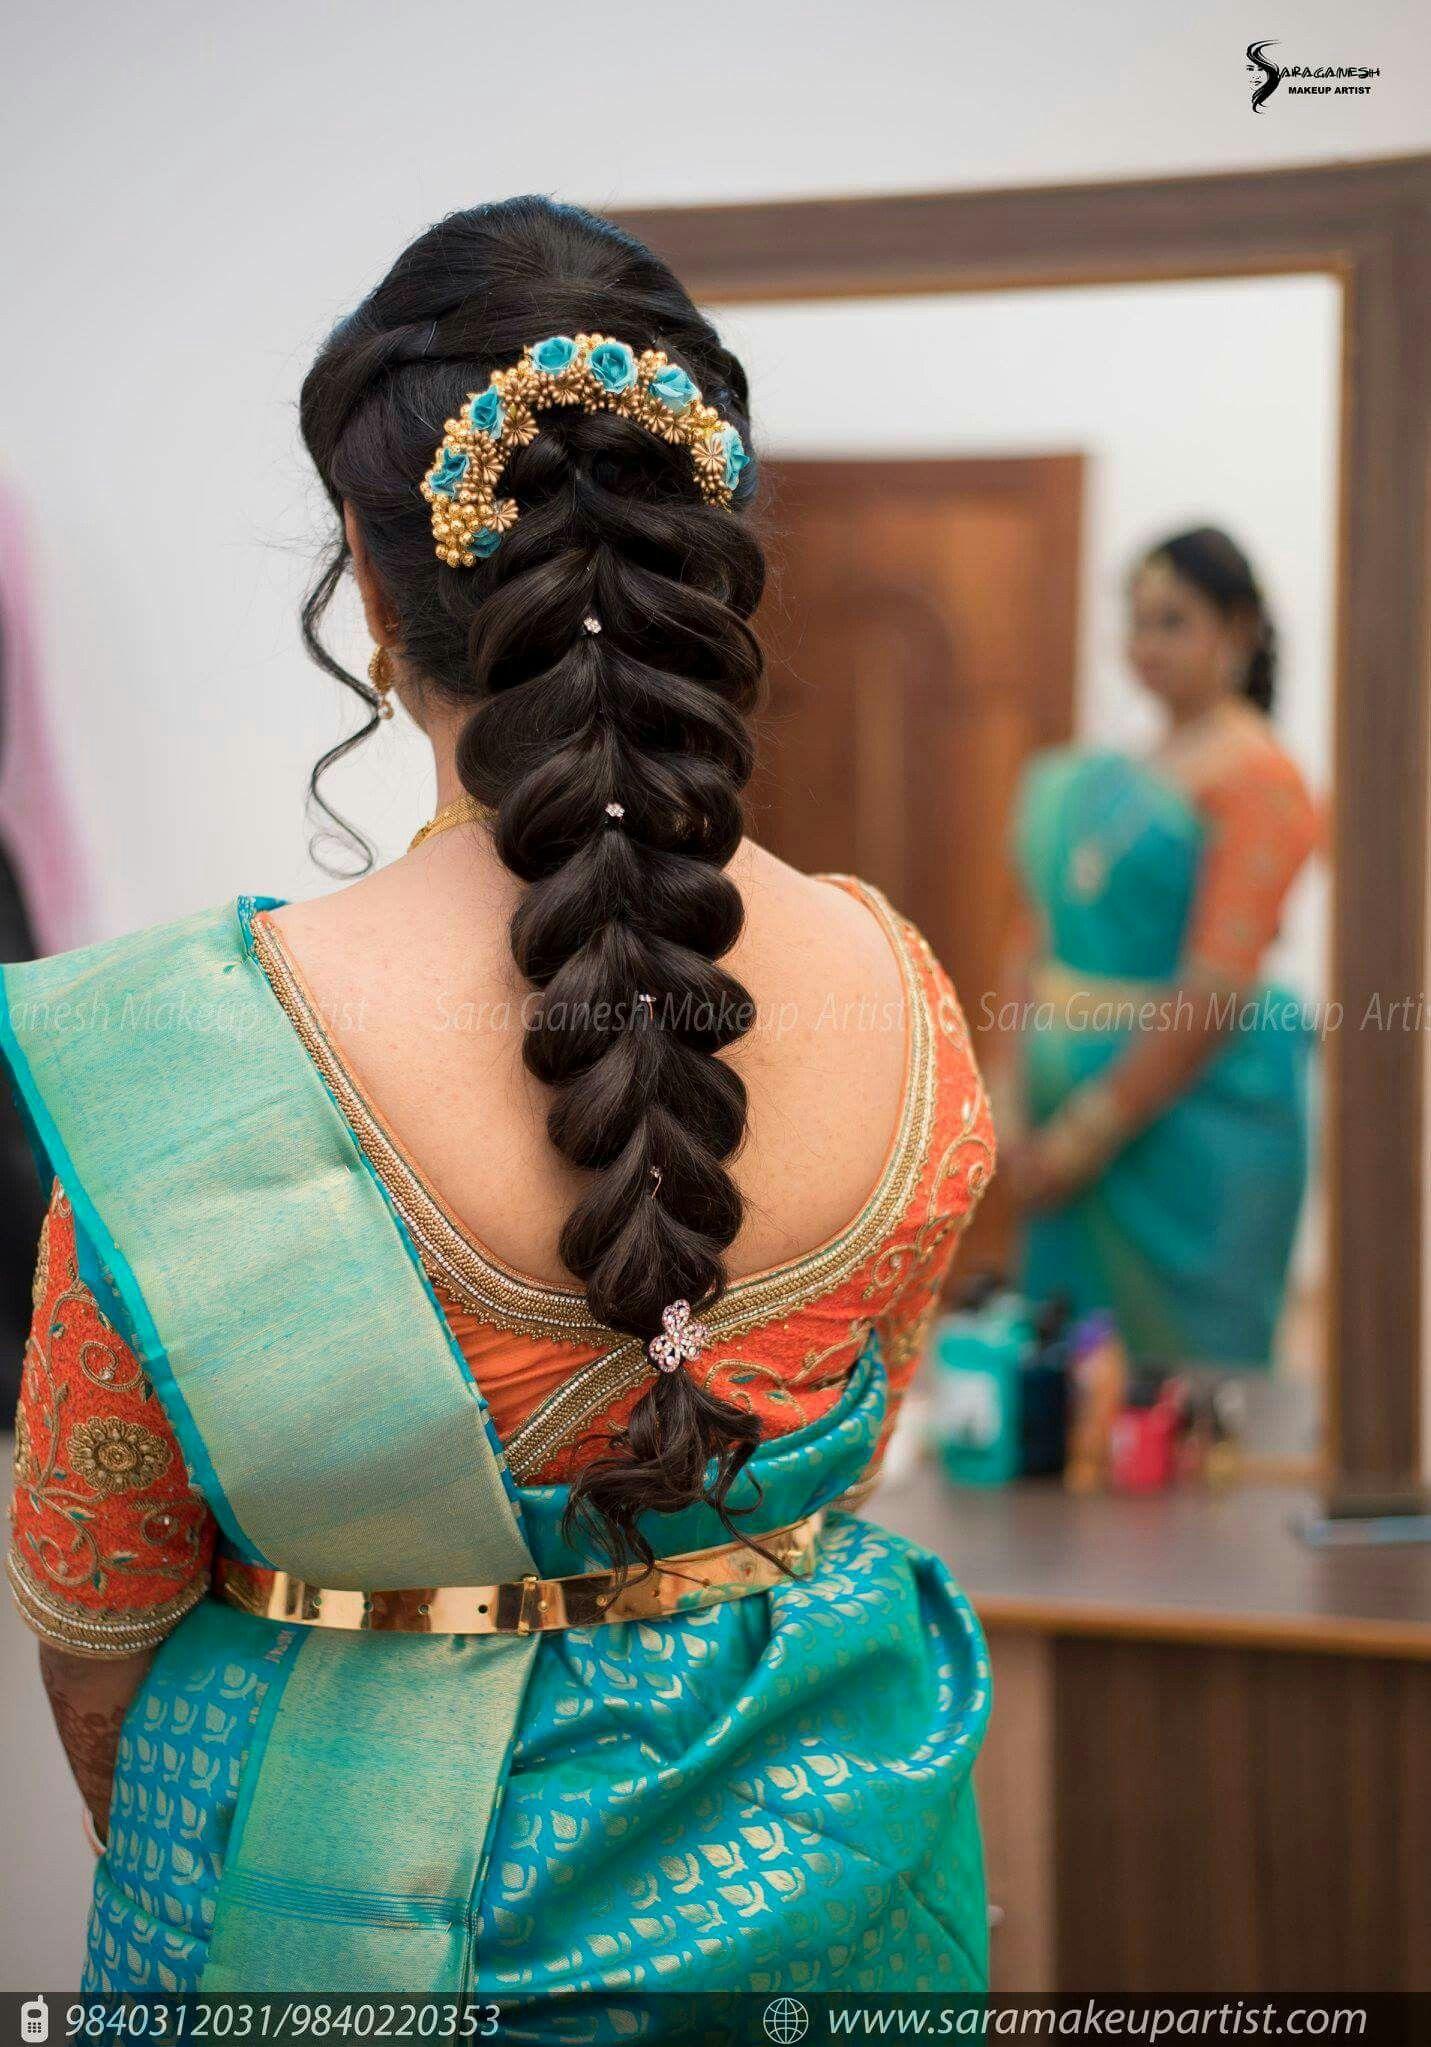 hair do | hair do | indian wedding hairstyles, wedding